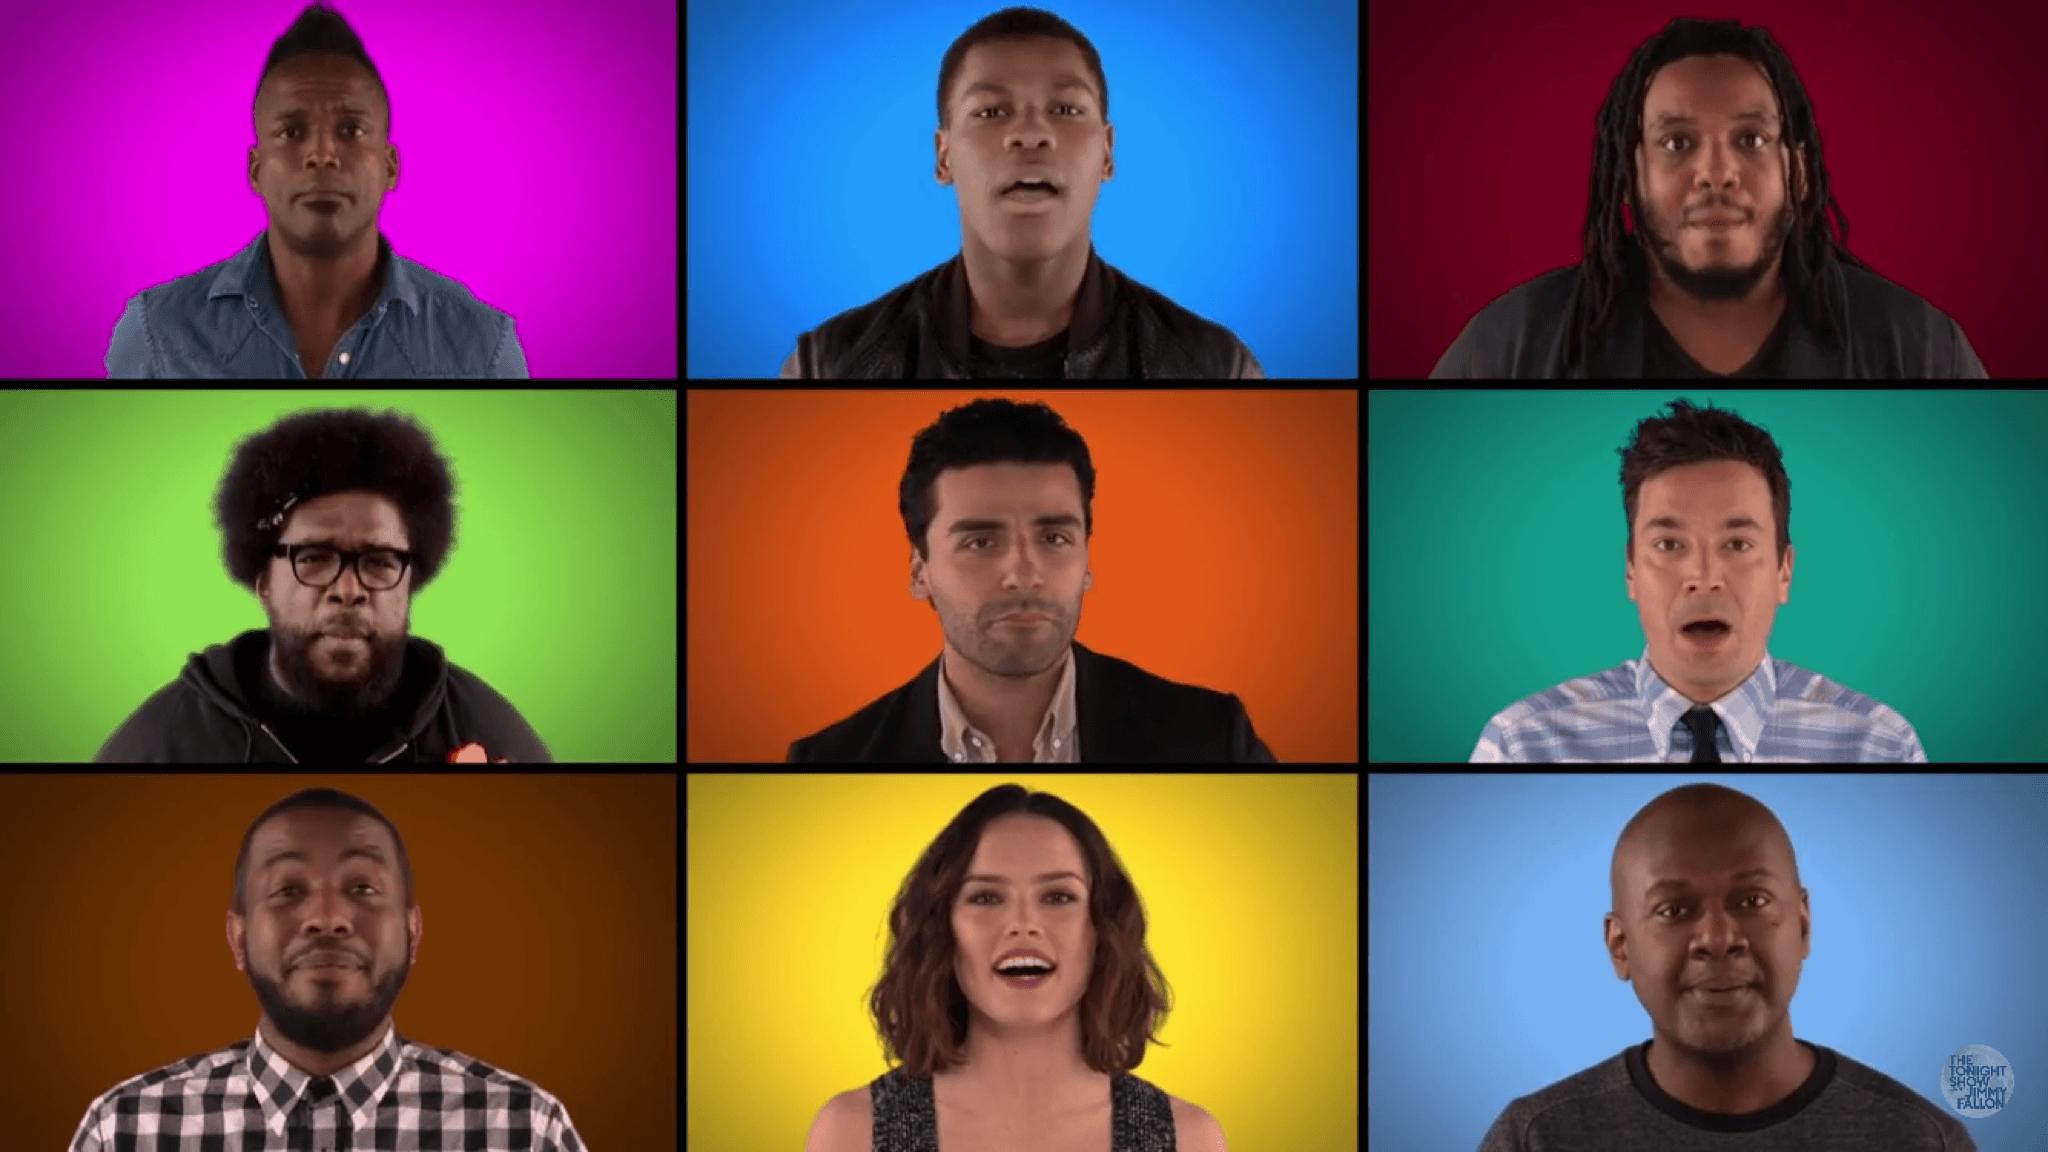 Star Wars: Jimmy Fallon, The Roots y actores interpretan soundtrack